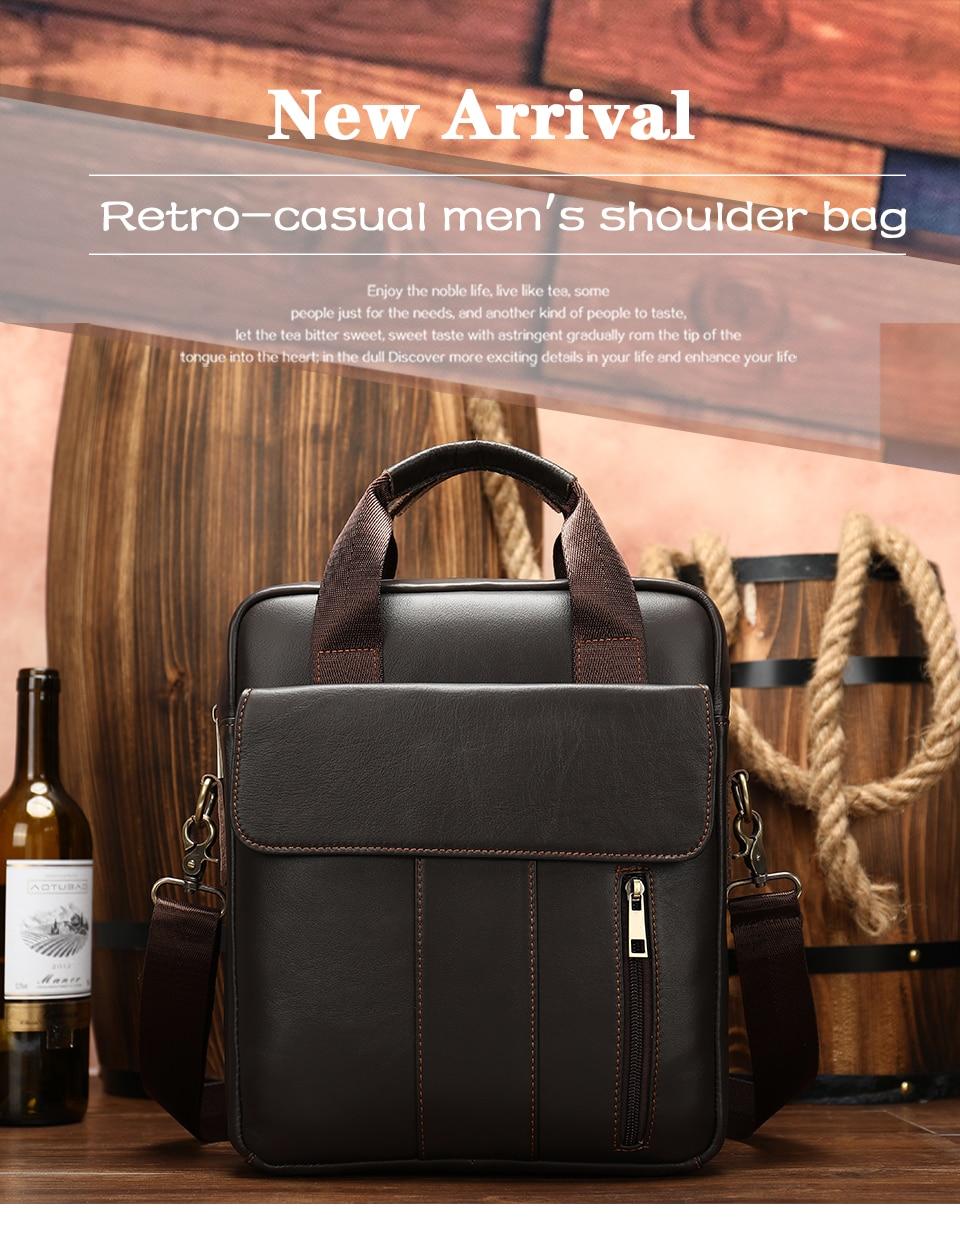 HTB1PBiWbRGw3KVjSZFwq6zQ2FXaA MVA genuine leather men's bag messenger bag men leather crossbody bags for men handbag business men's laptop/shoulder bag 8568